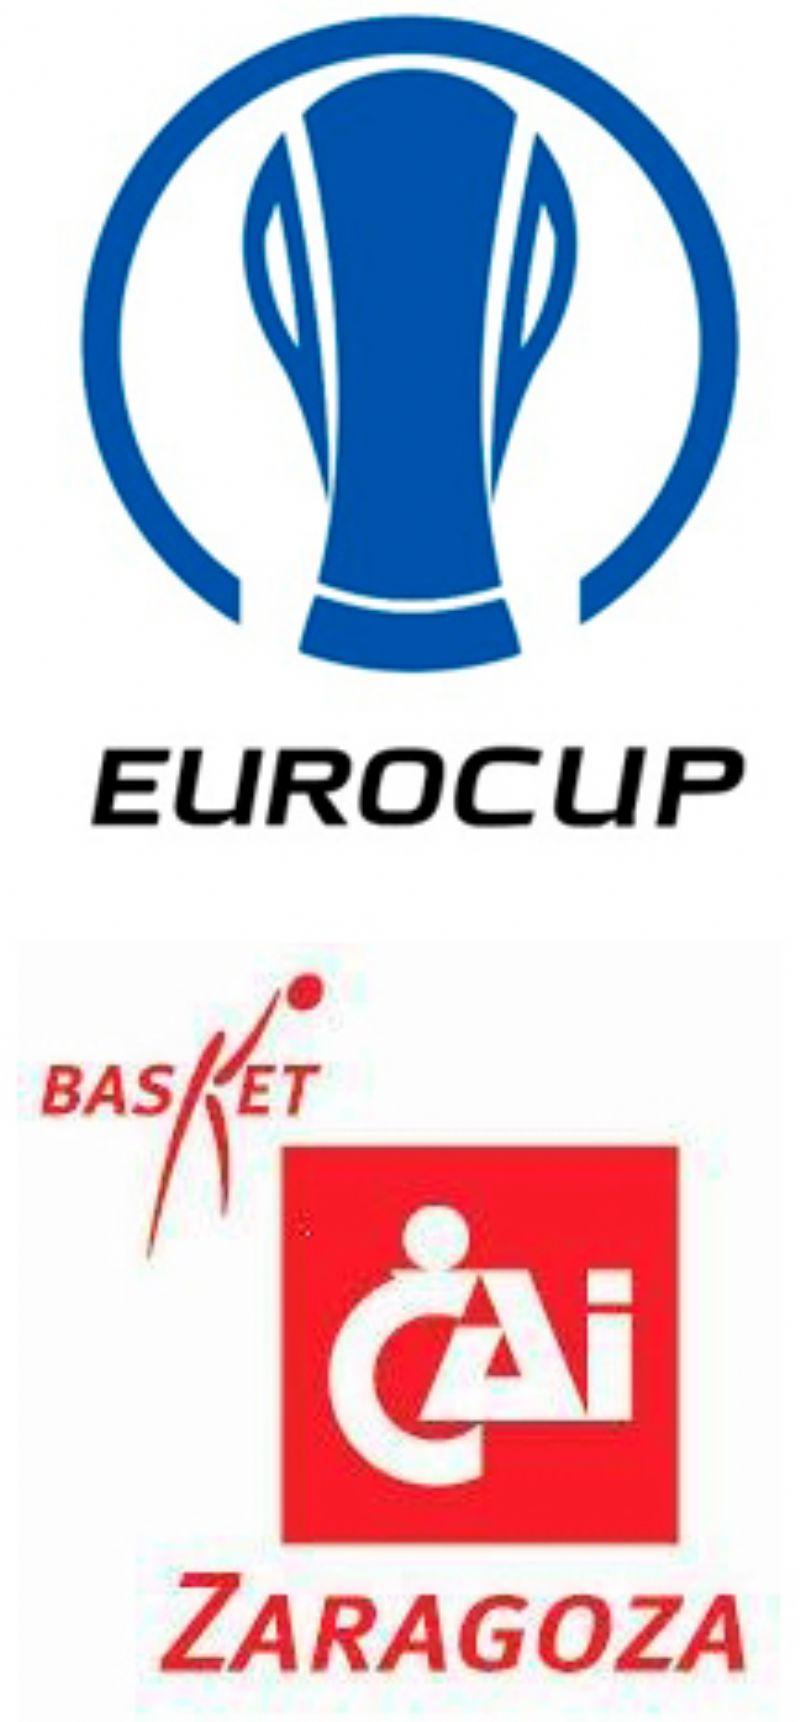 CAI Zaragoza - Valencia Basket